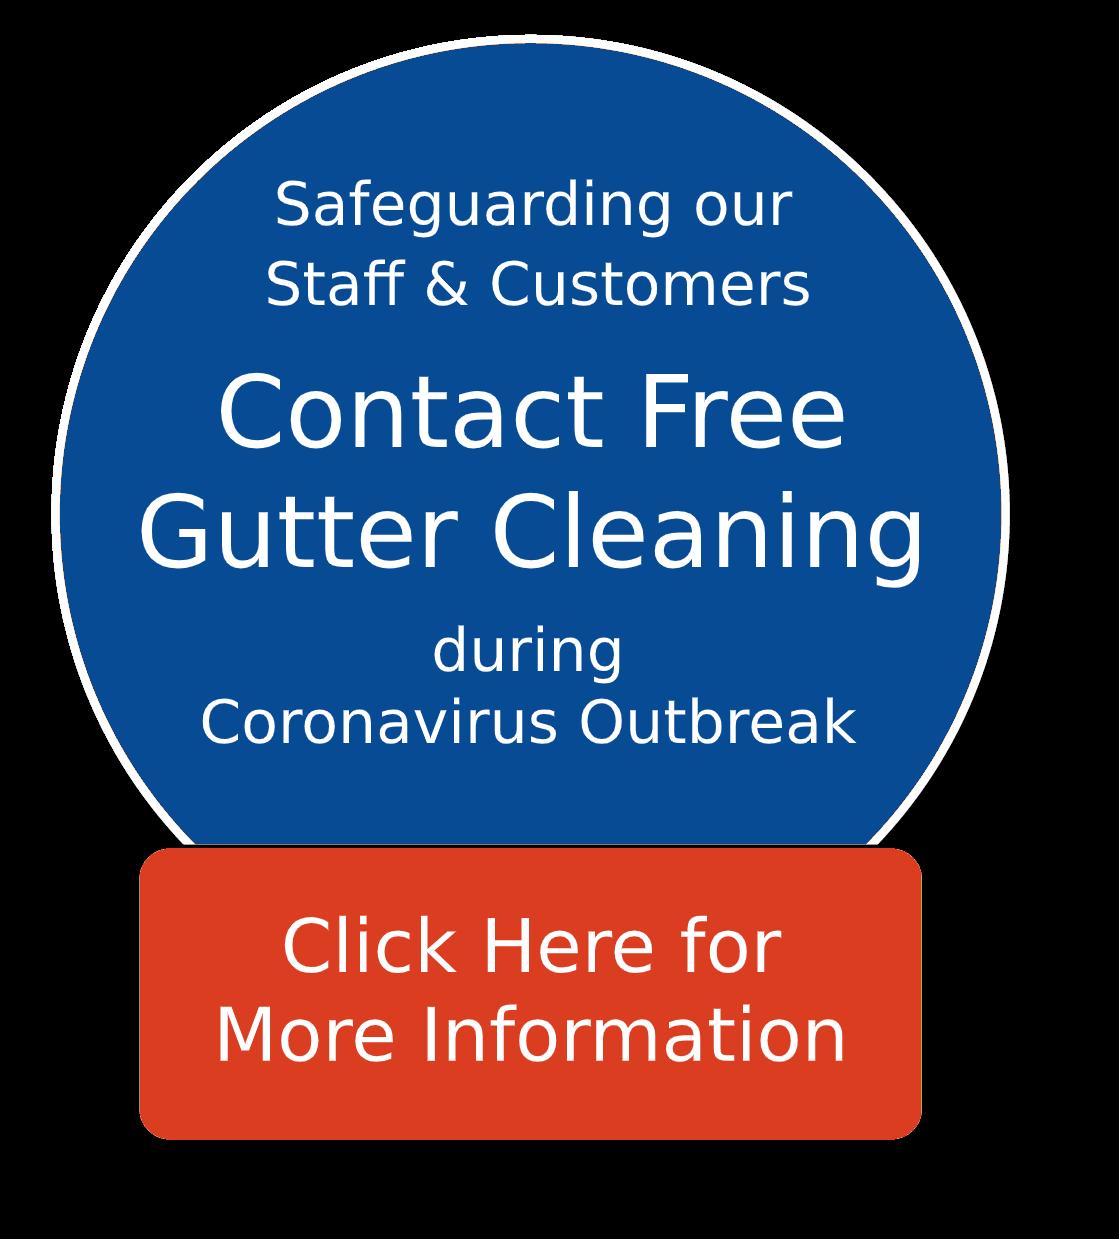 Gutter Clean Company Covid 19 Coronavirus